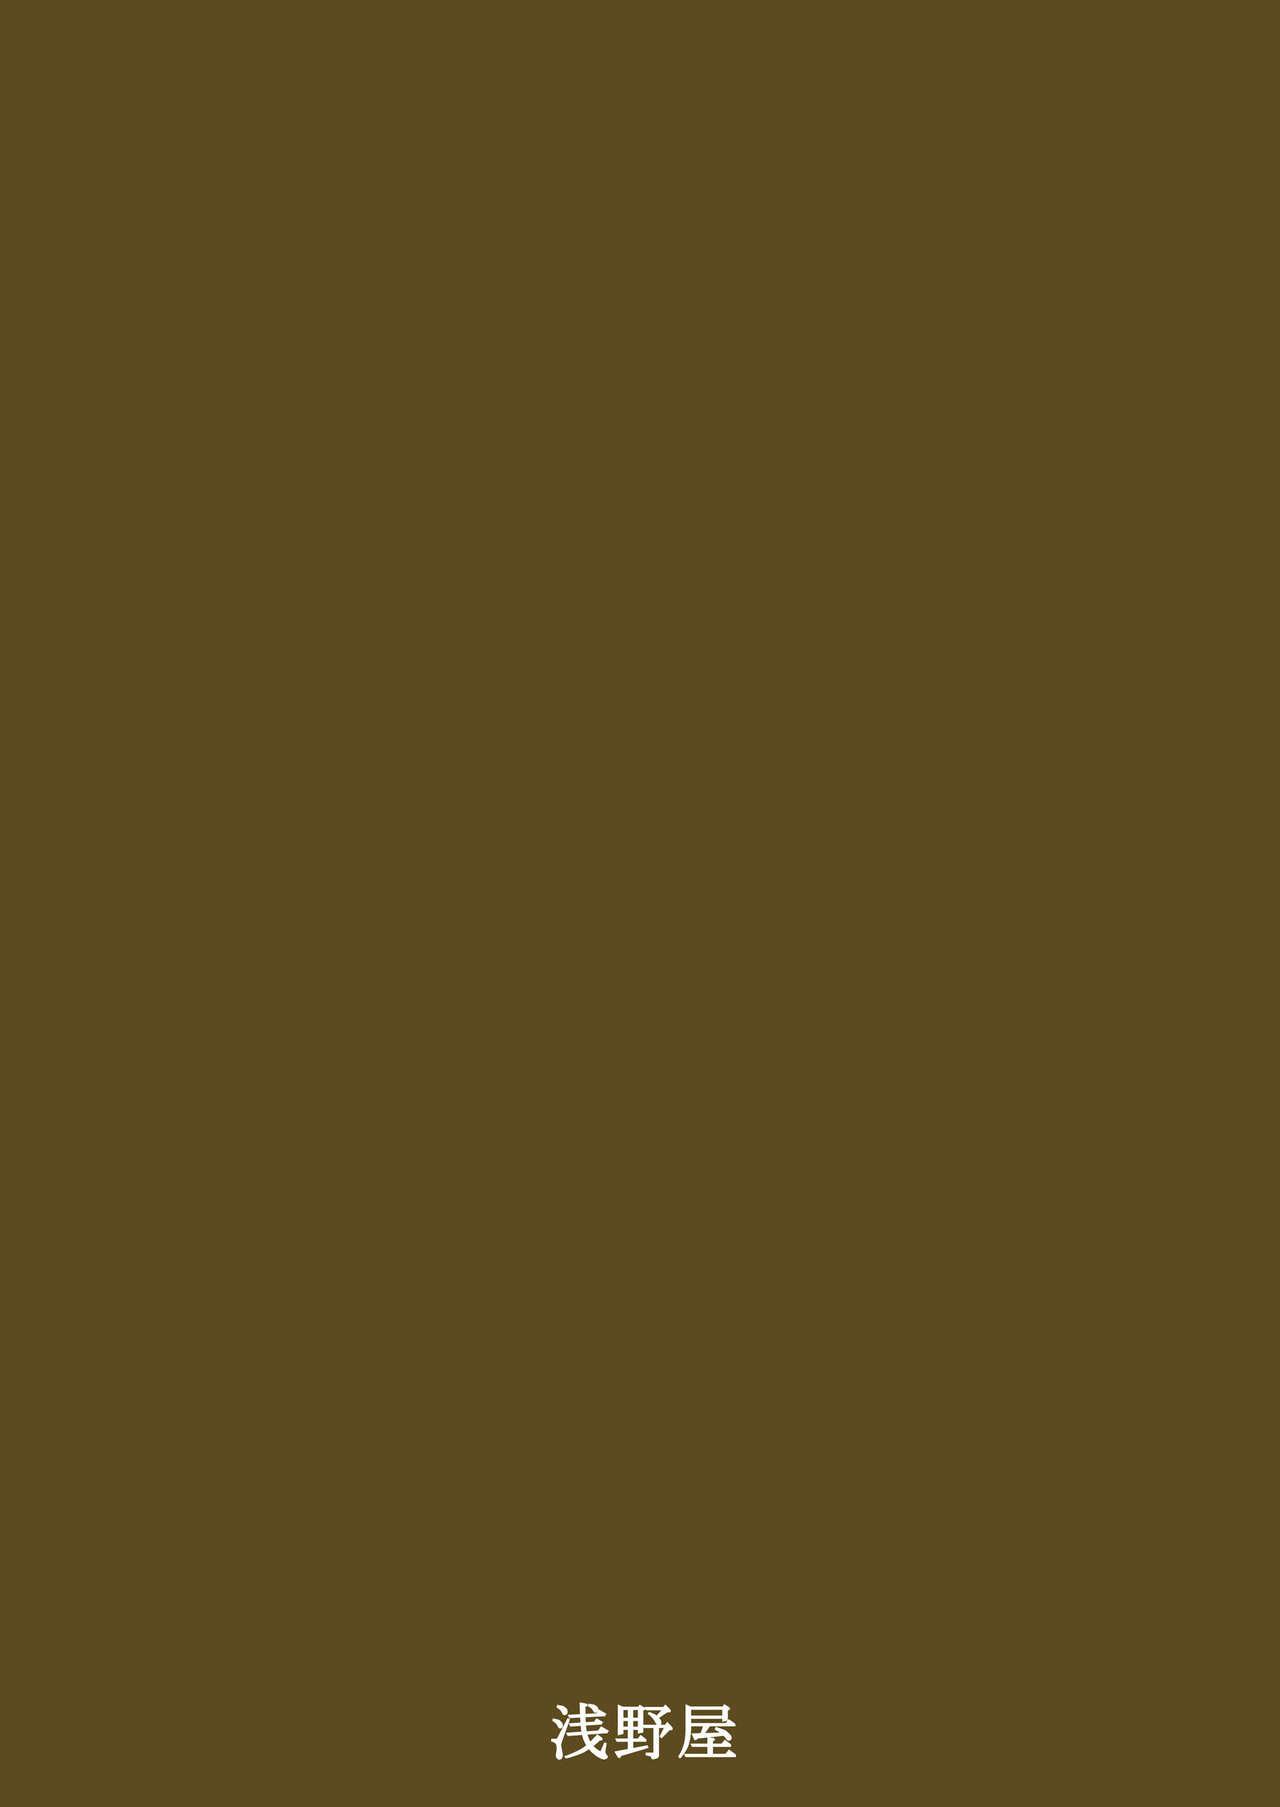 [Asanoya (Kittsu)] Toraware Hime III - Asuna Nakadashi 100-nin Dekiru ka na   Hostage Princess III (Sword Art Online) [English] [HypnoMangaEditor] [Digital] 29